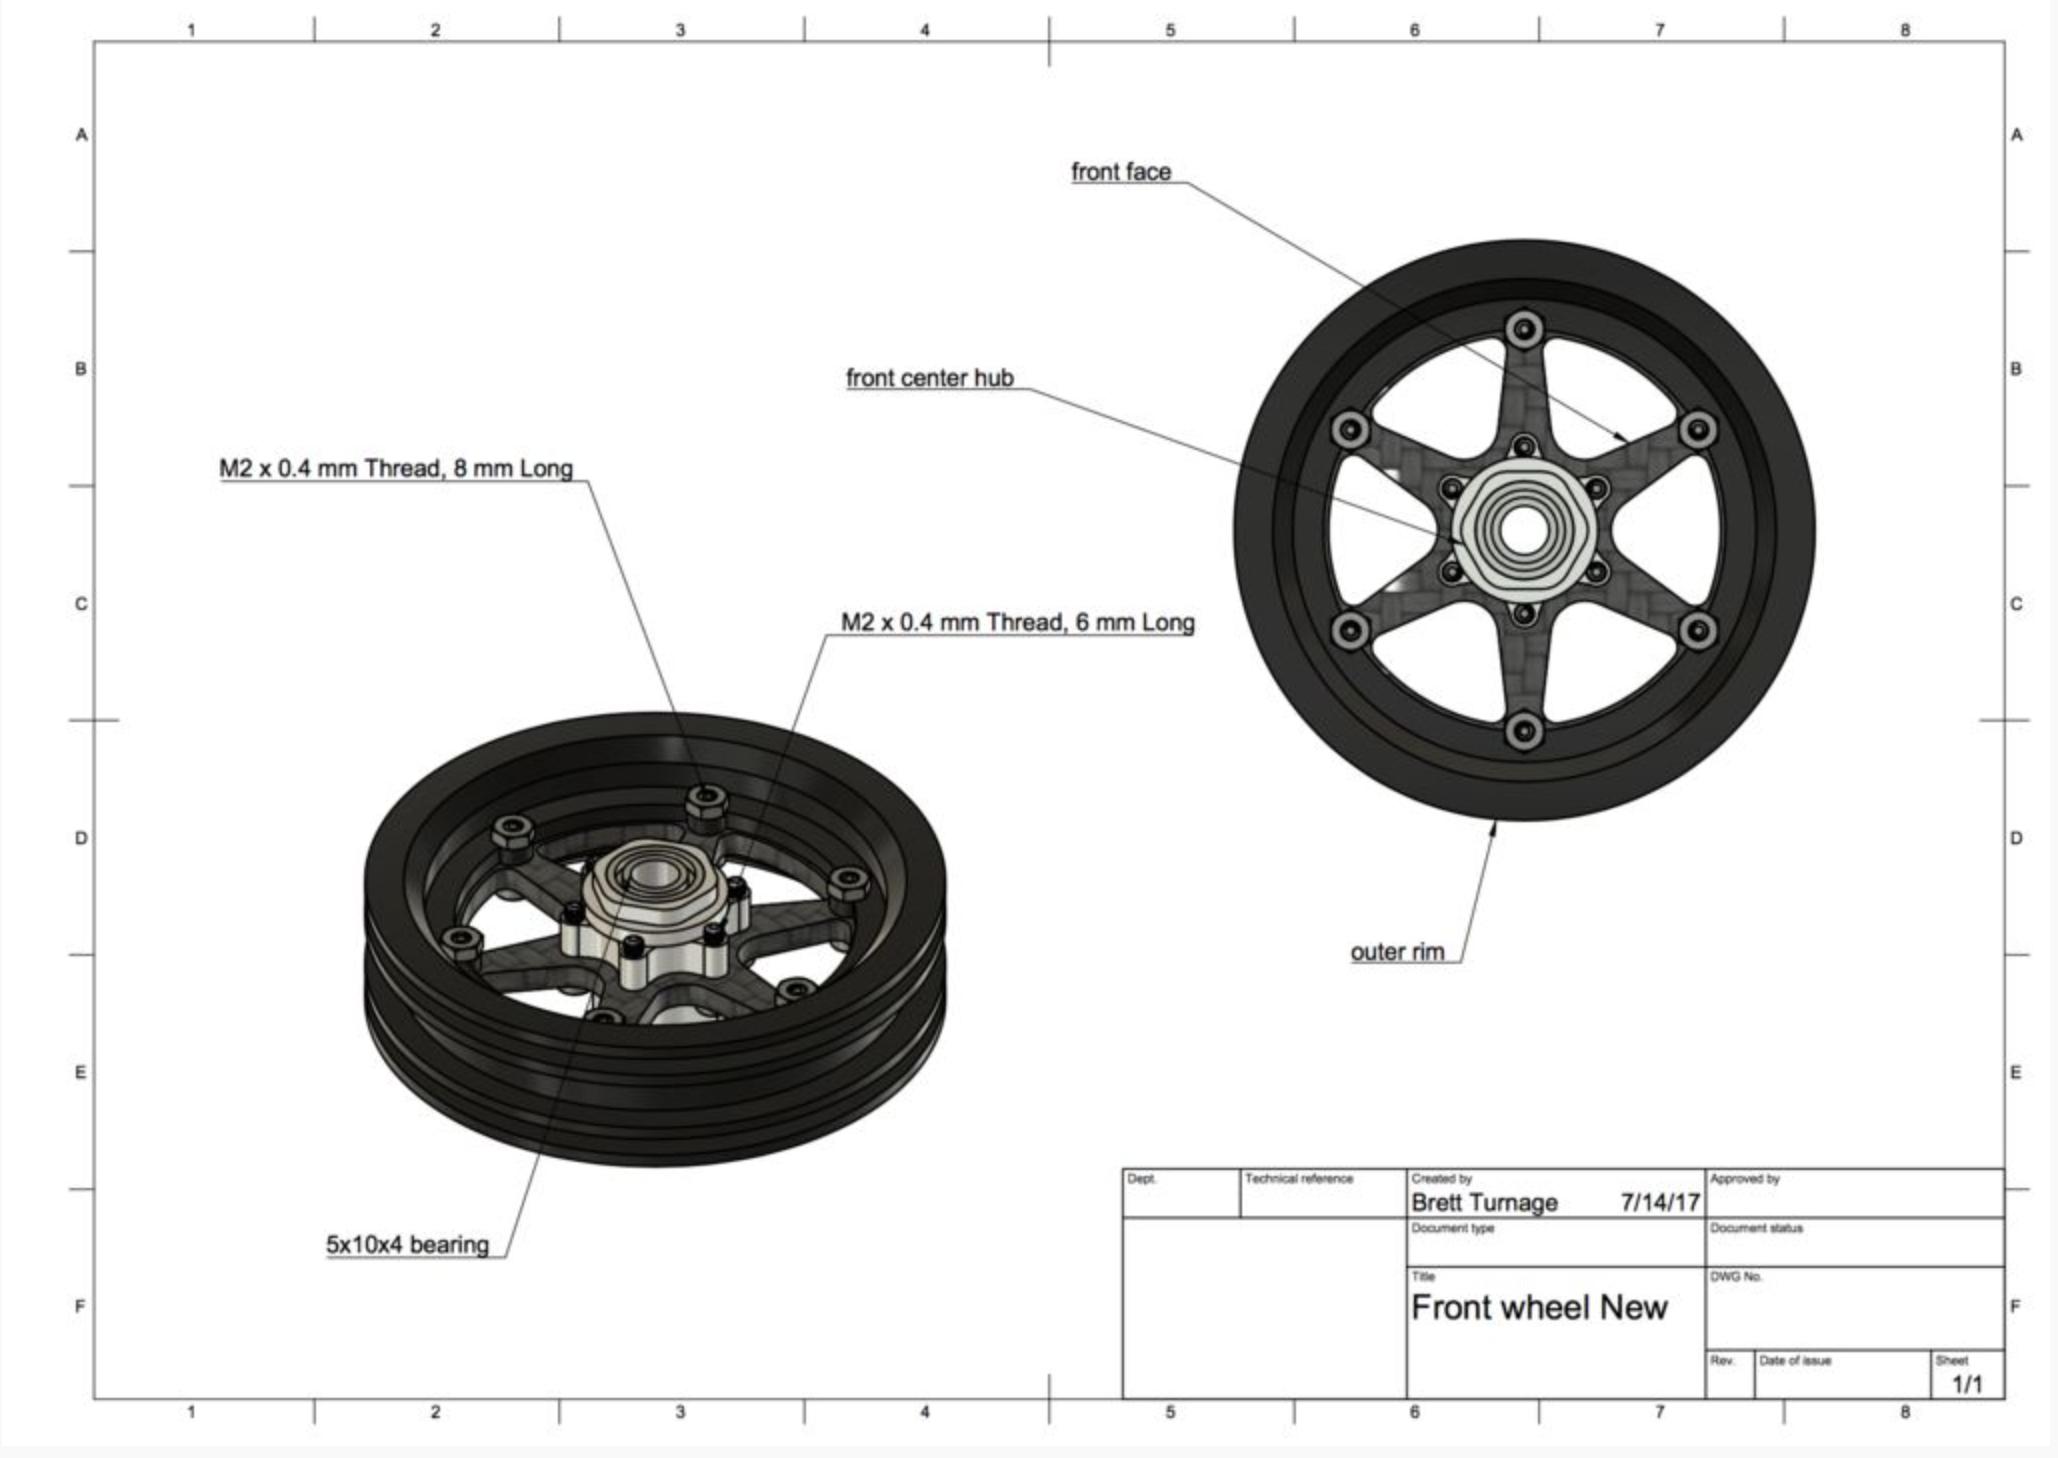 Screen Shot 2017-07-17 at 8.05.50 AM.png Download free STL file 2016 Suzuki GSX-RR 1:8 Racing RC MotoGP Version 2 • 3D print design, brett